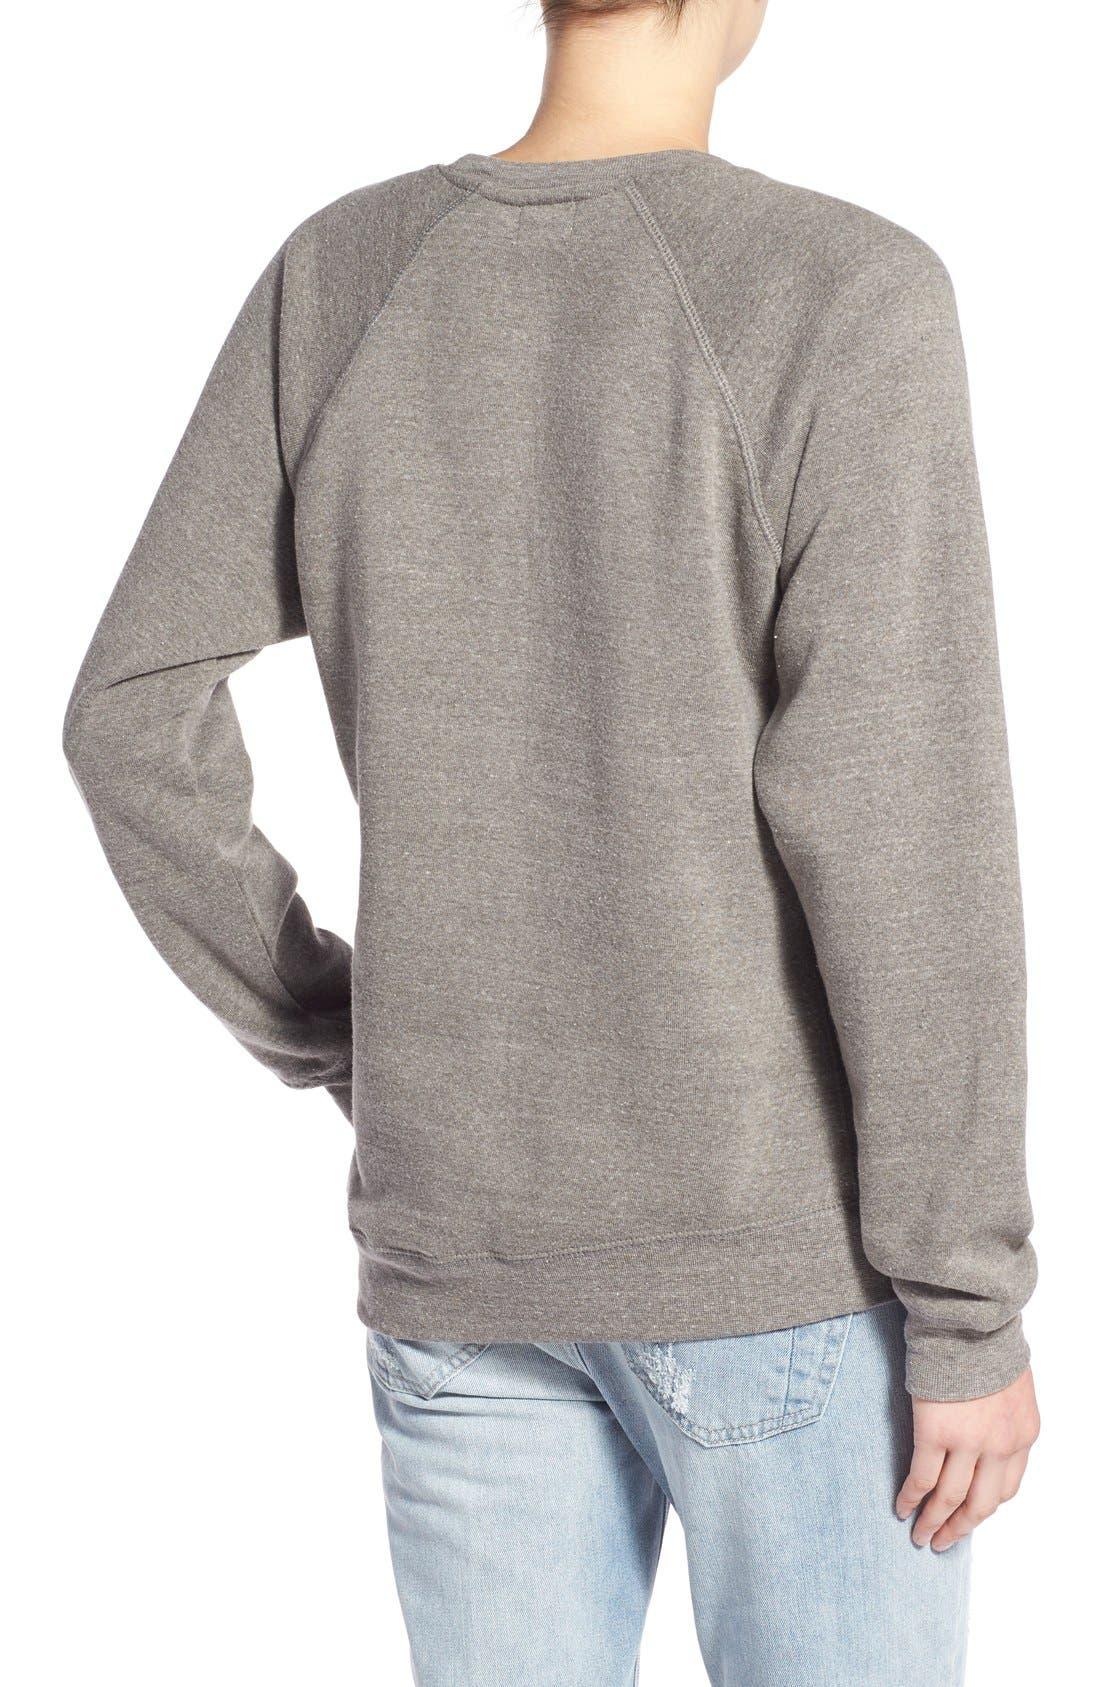 'Good Mood' Graphic Sweatshirt,                             Alternate thumbnail 4, color,                             050